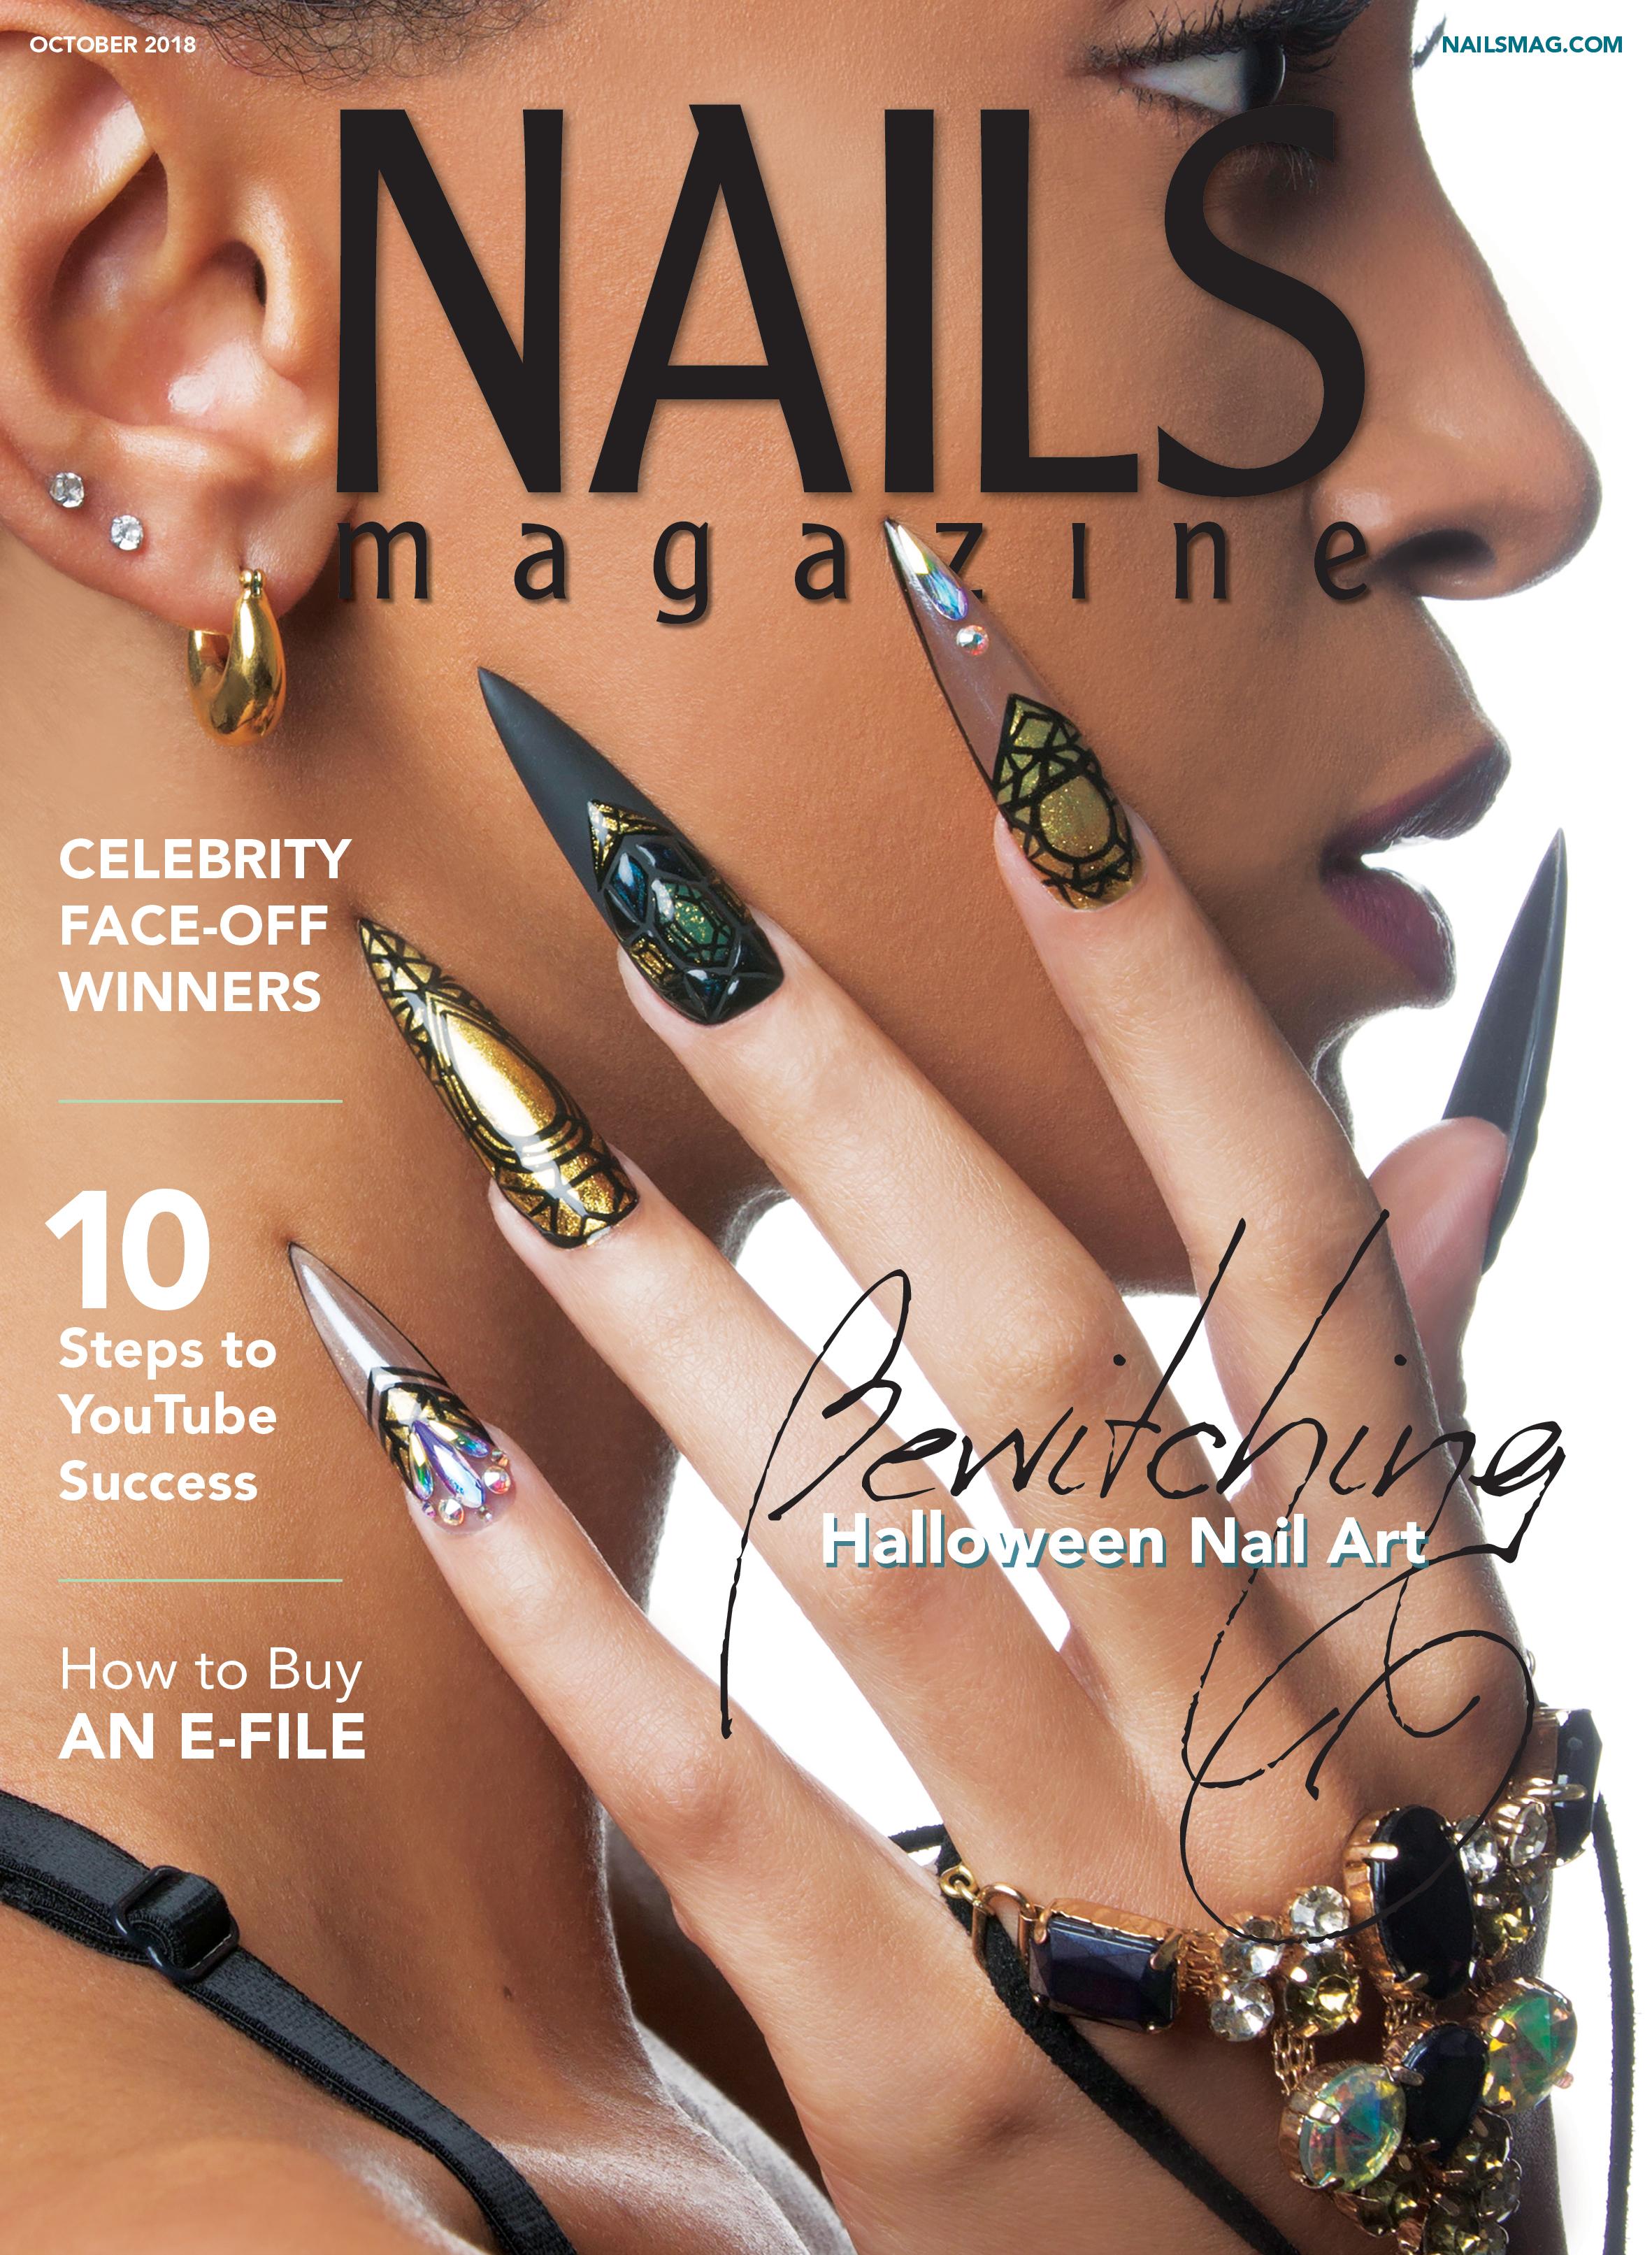 Nails Magazine October 2018 Issue